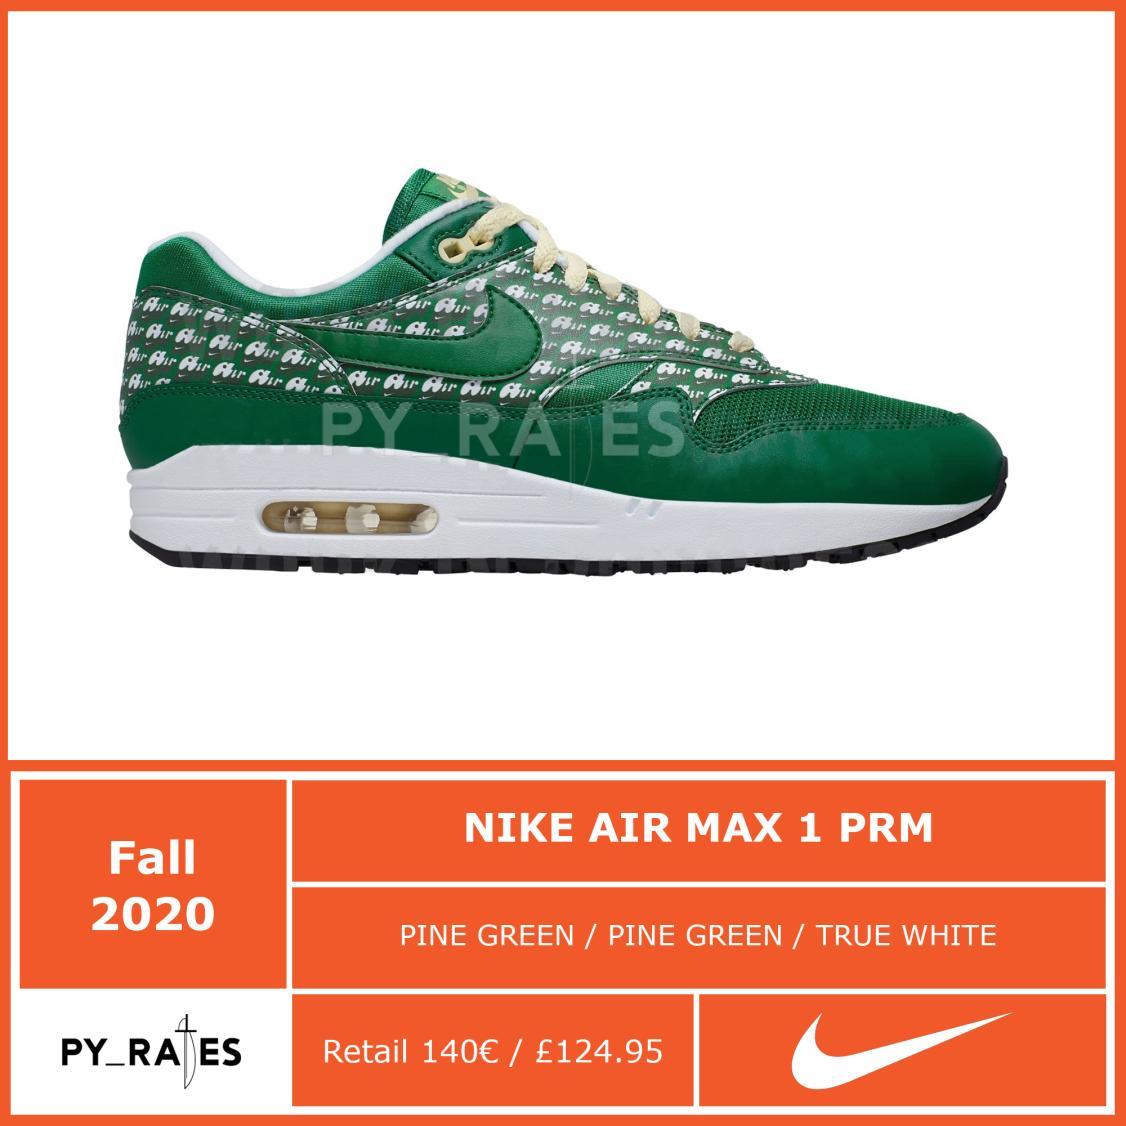 Nike Air Max 1 Powerwall Pine Green Release Date Info